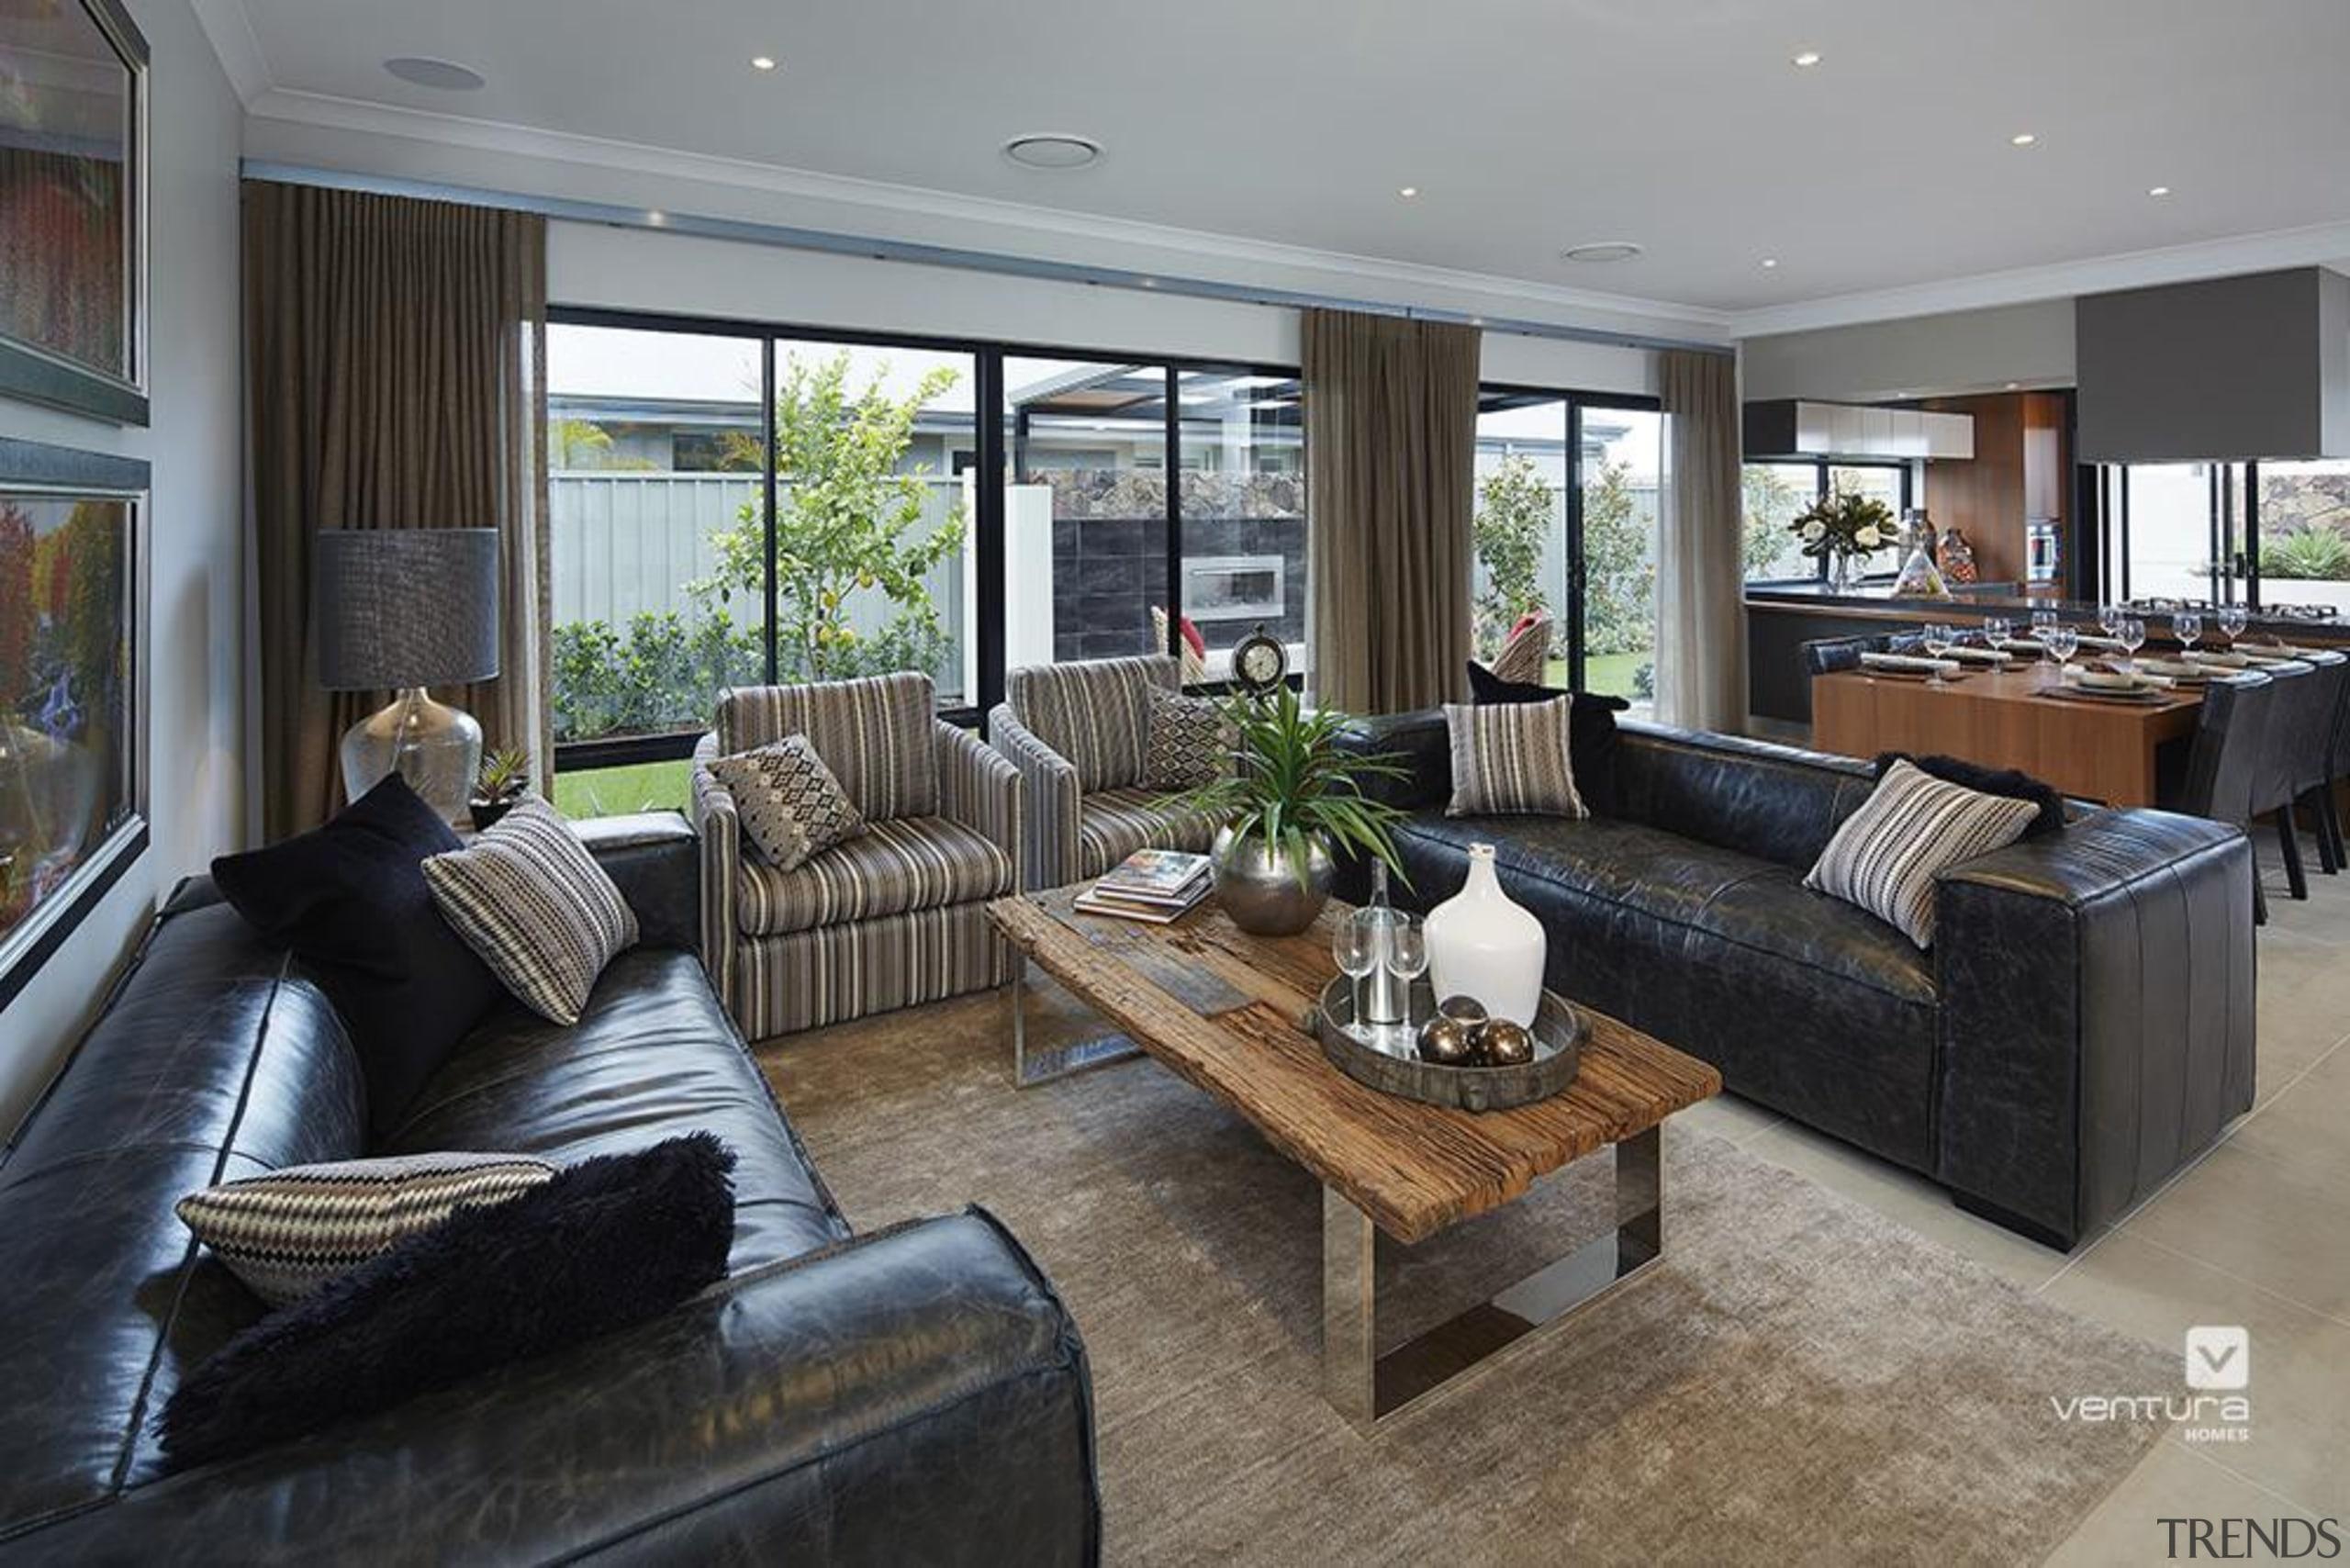 Living Room Design. - The Macquarie Display Home house, interior design, living room, property, real estate, room, gray, black